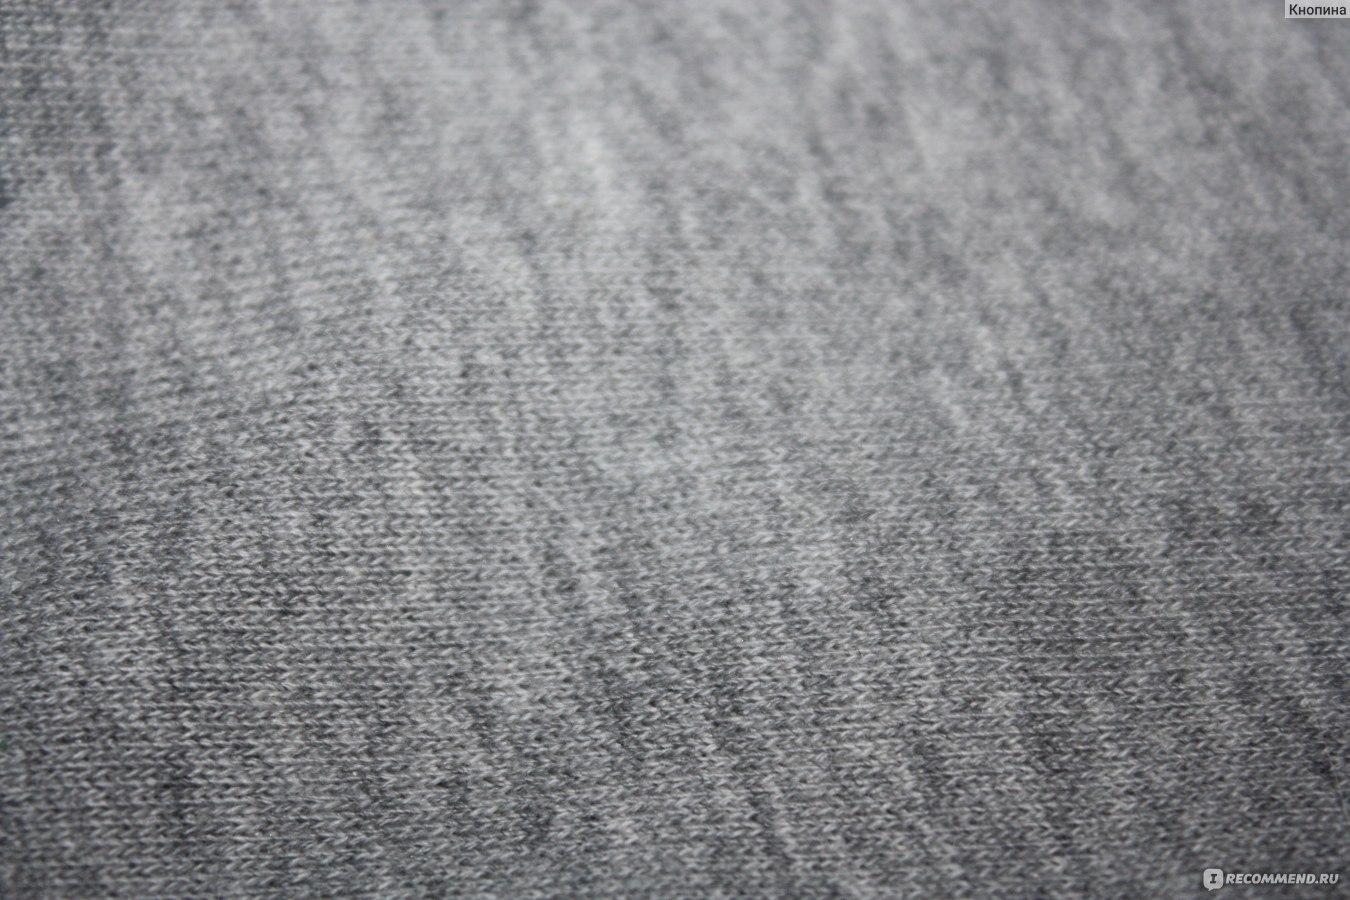 4c9742d5a067 Спортивный костюм AliExpress 2016 Autumn Winter Women Cotton Tracksuit 2  Piece Set Clothing Solid Sportwear Suit